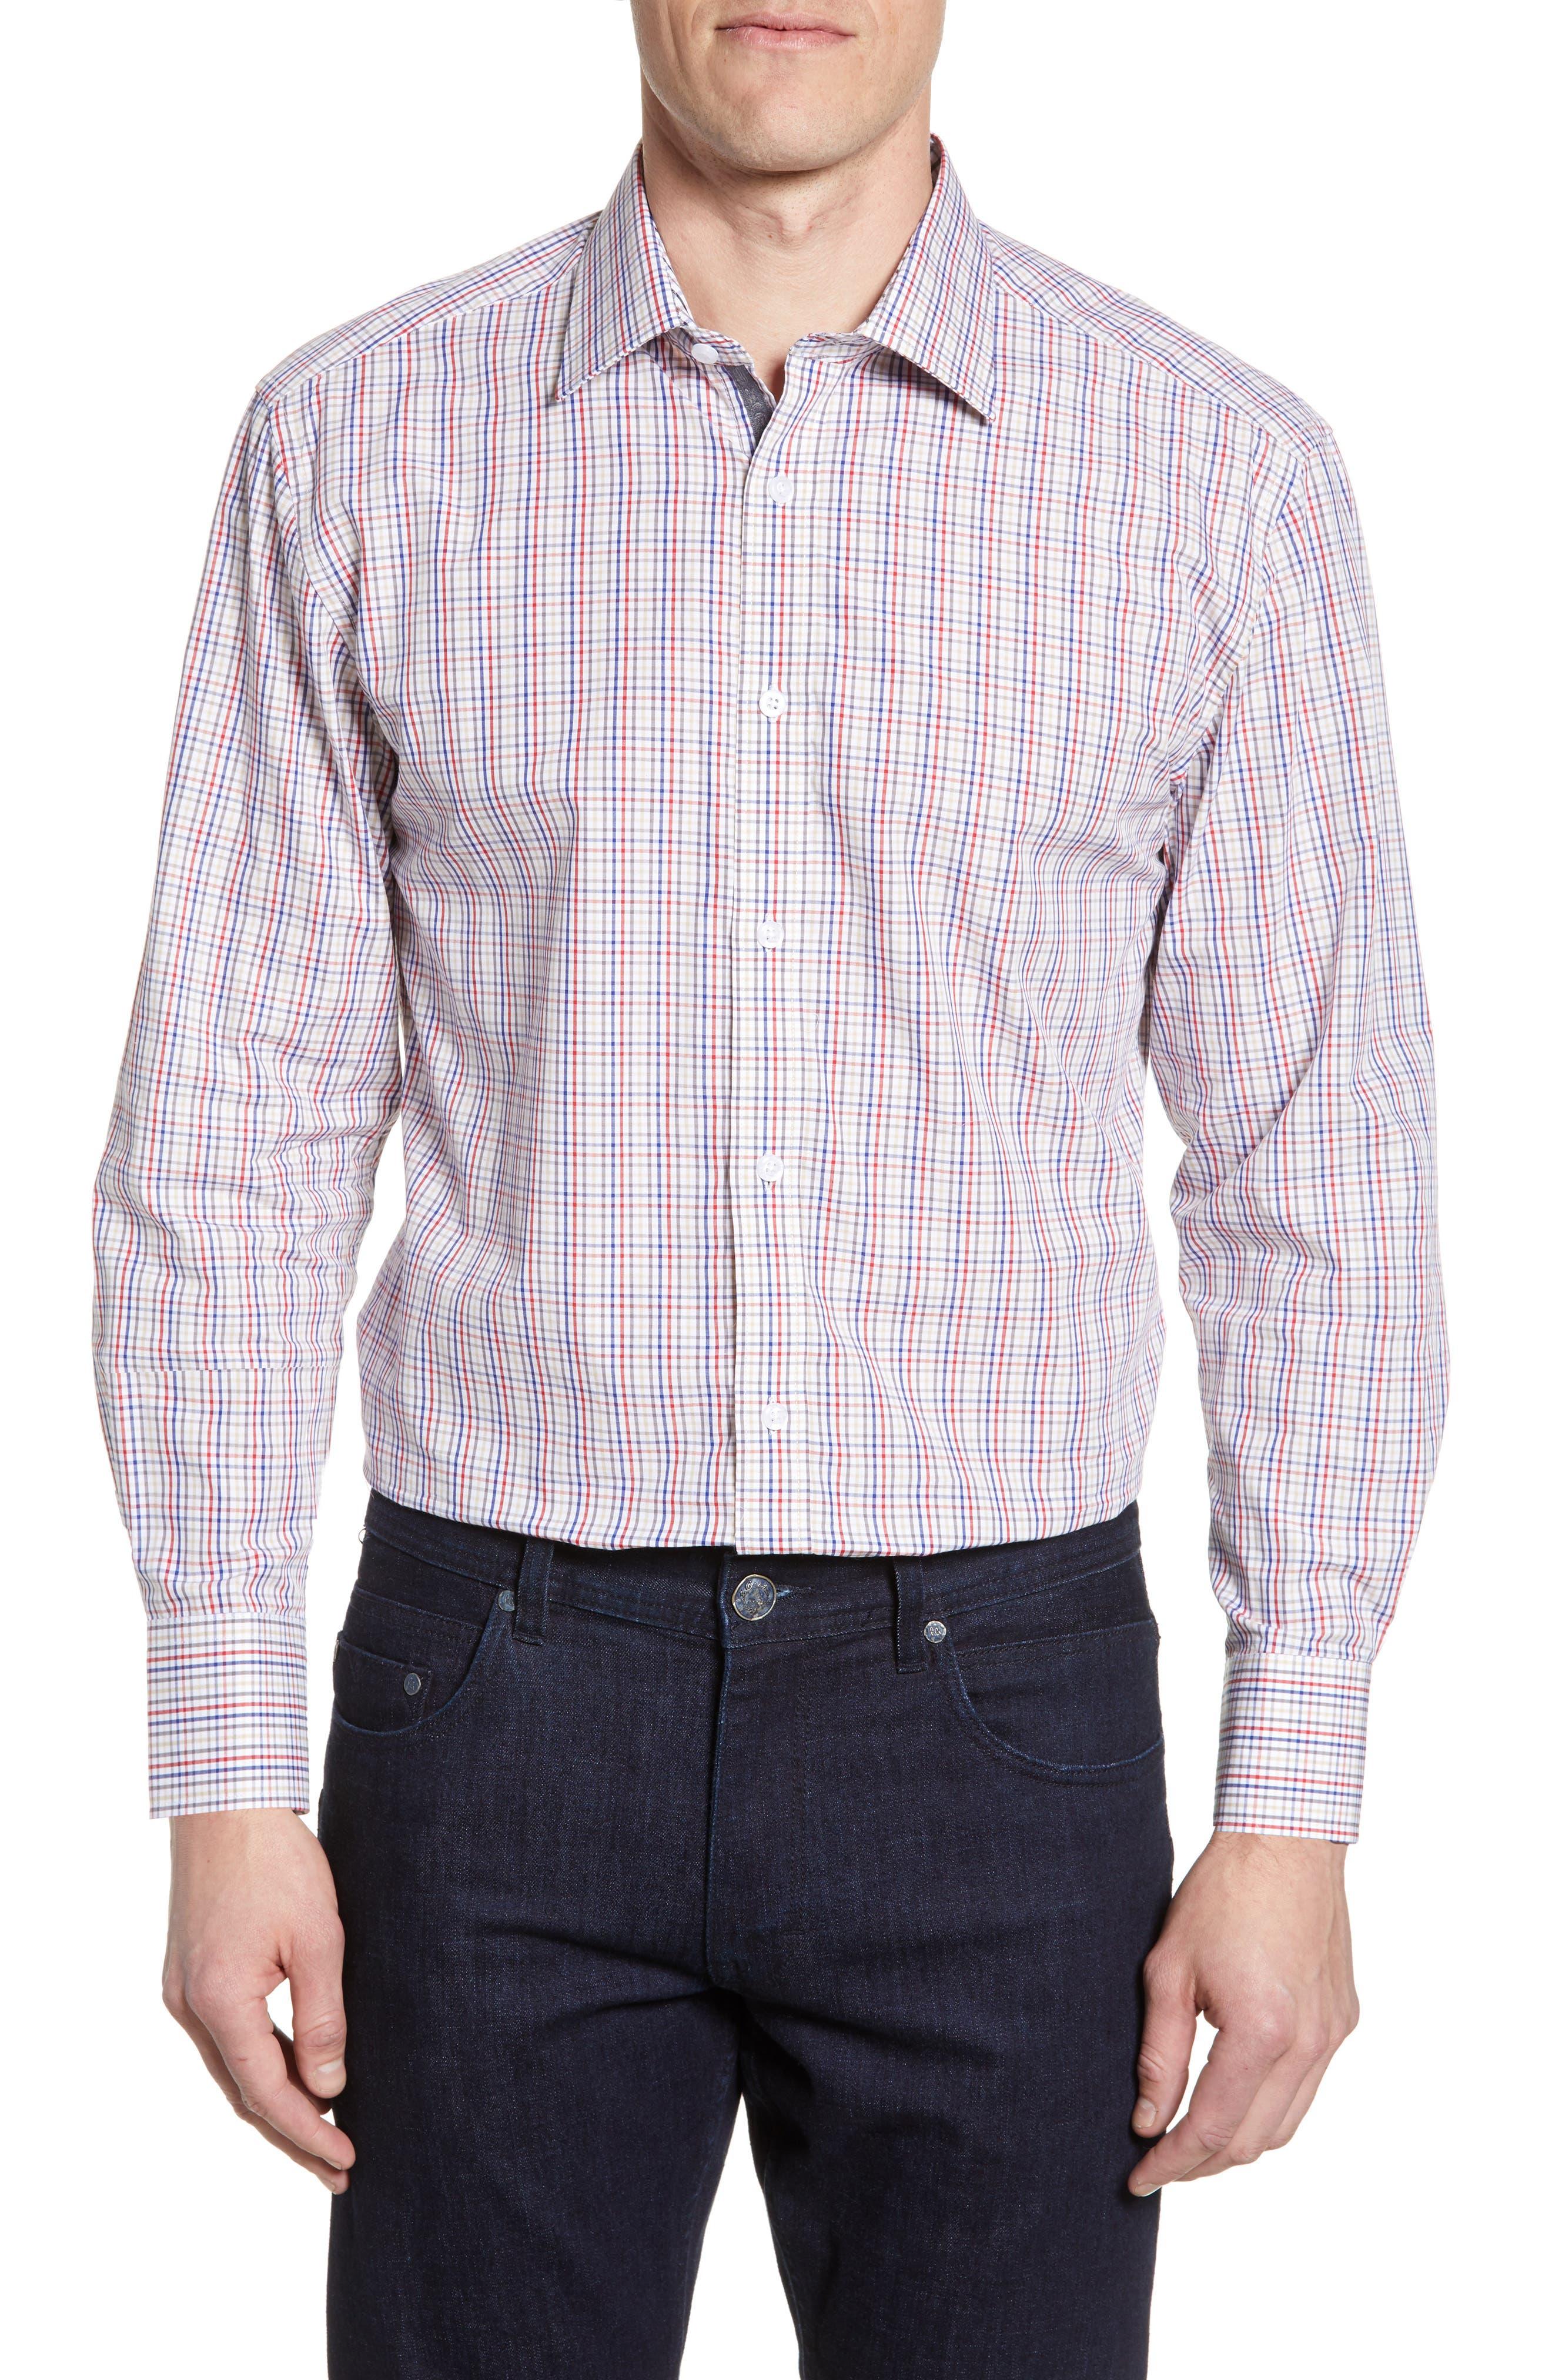 Image of English Laundry Trim Fit Plaid Dress Shirt